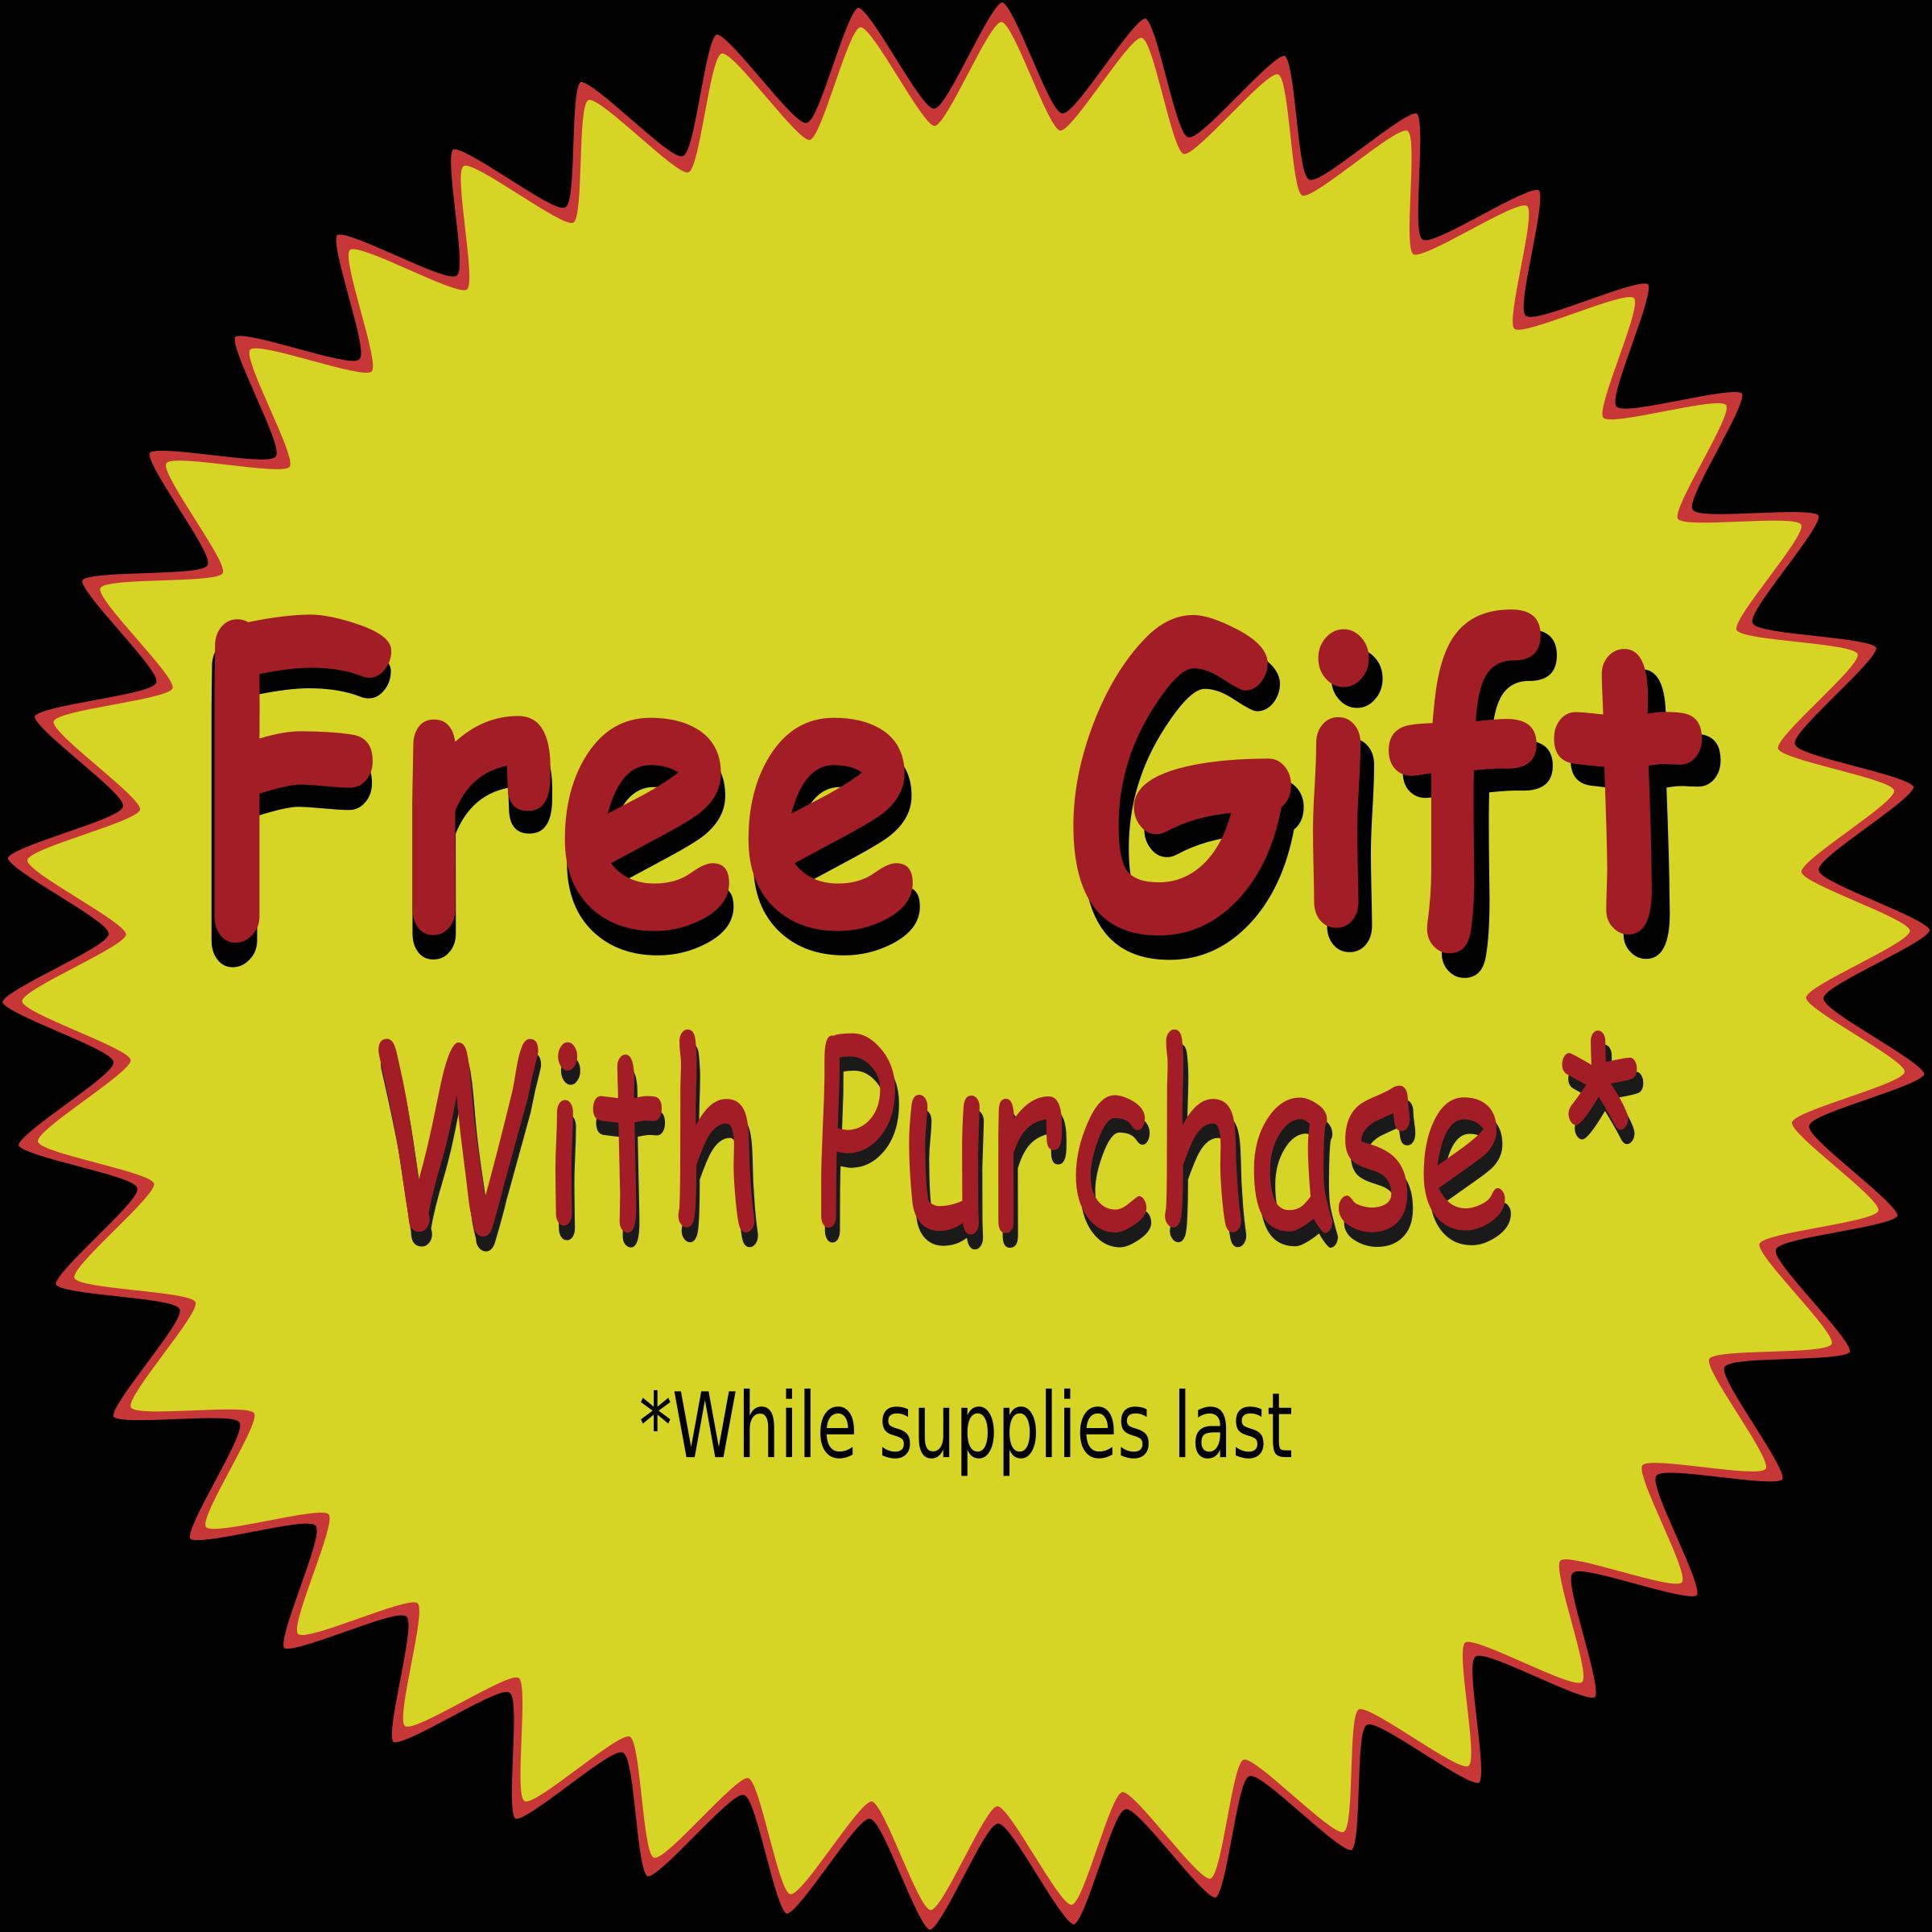 purchase clip art online - photo #48